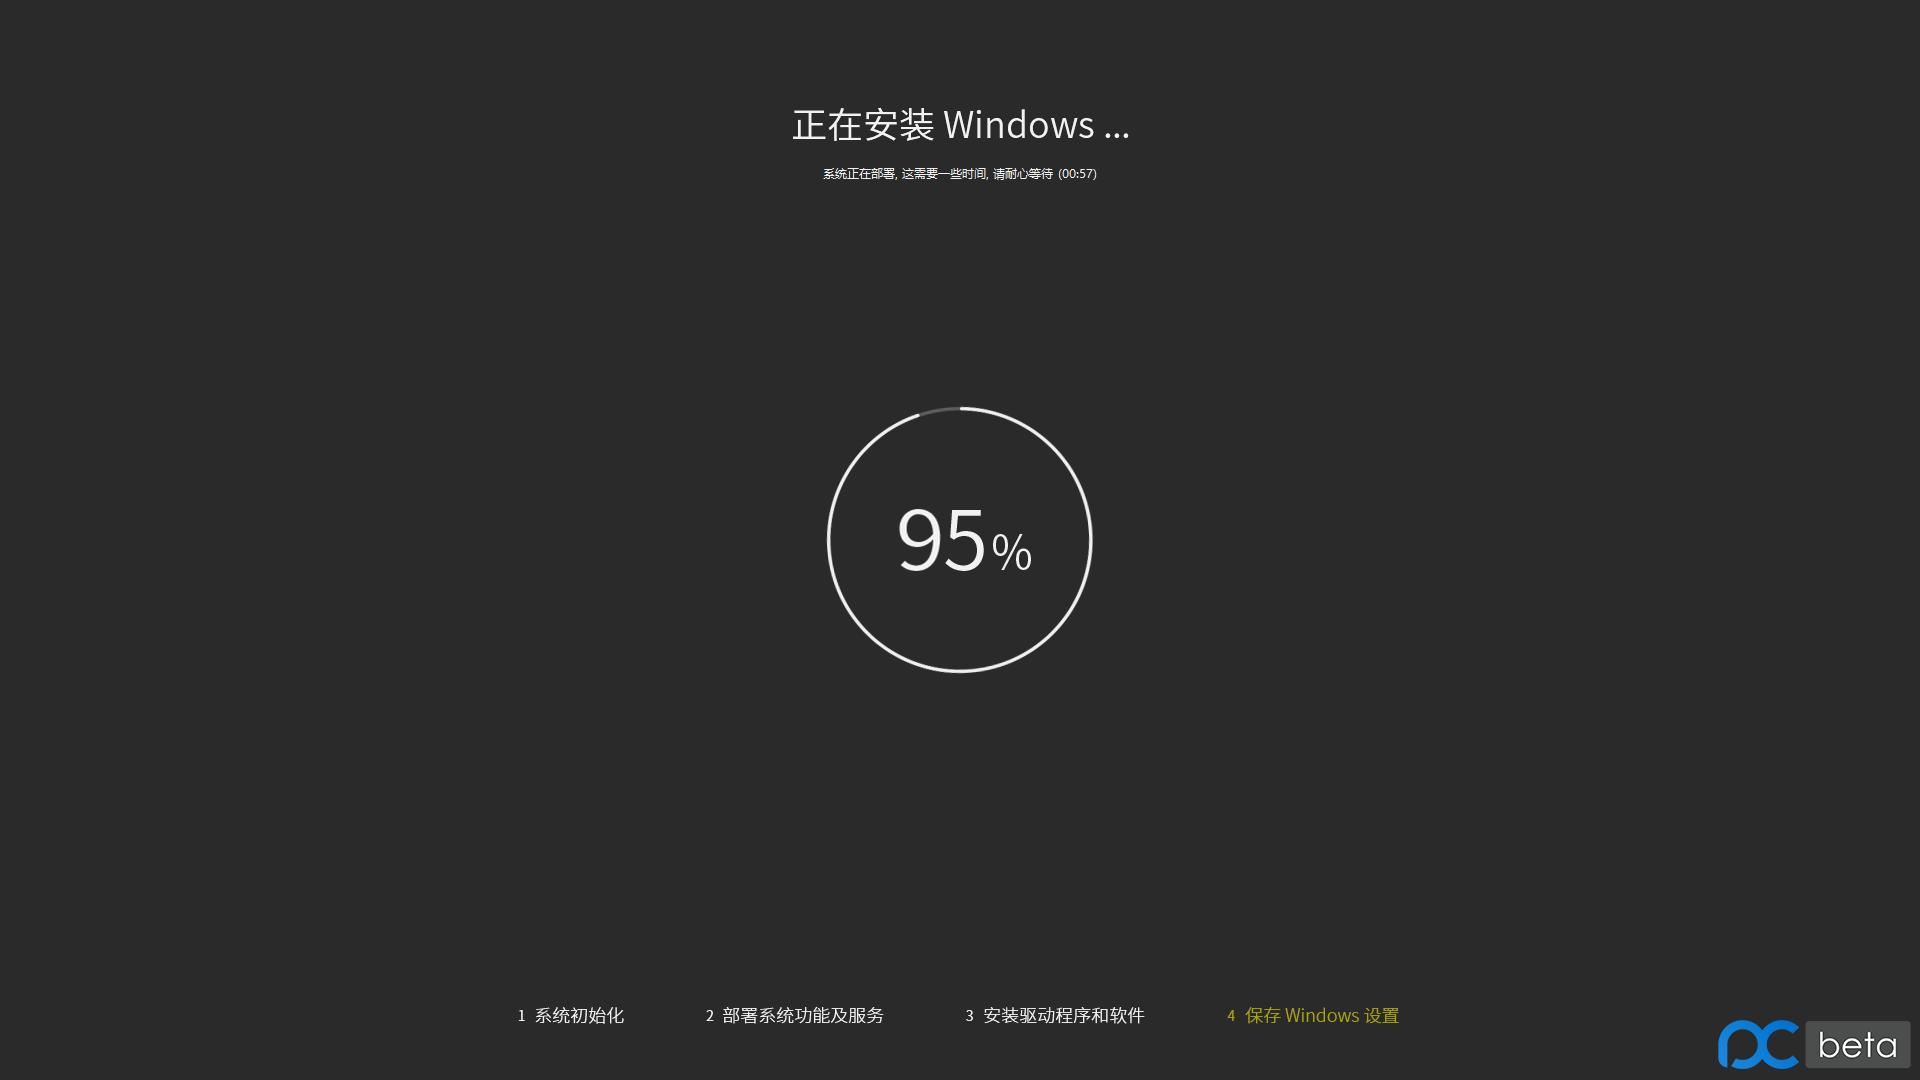 Windows 10 x64-2019-07-01-23-32-36.png